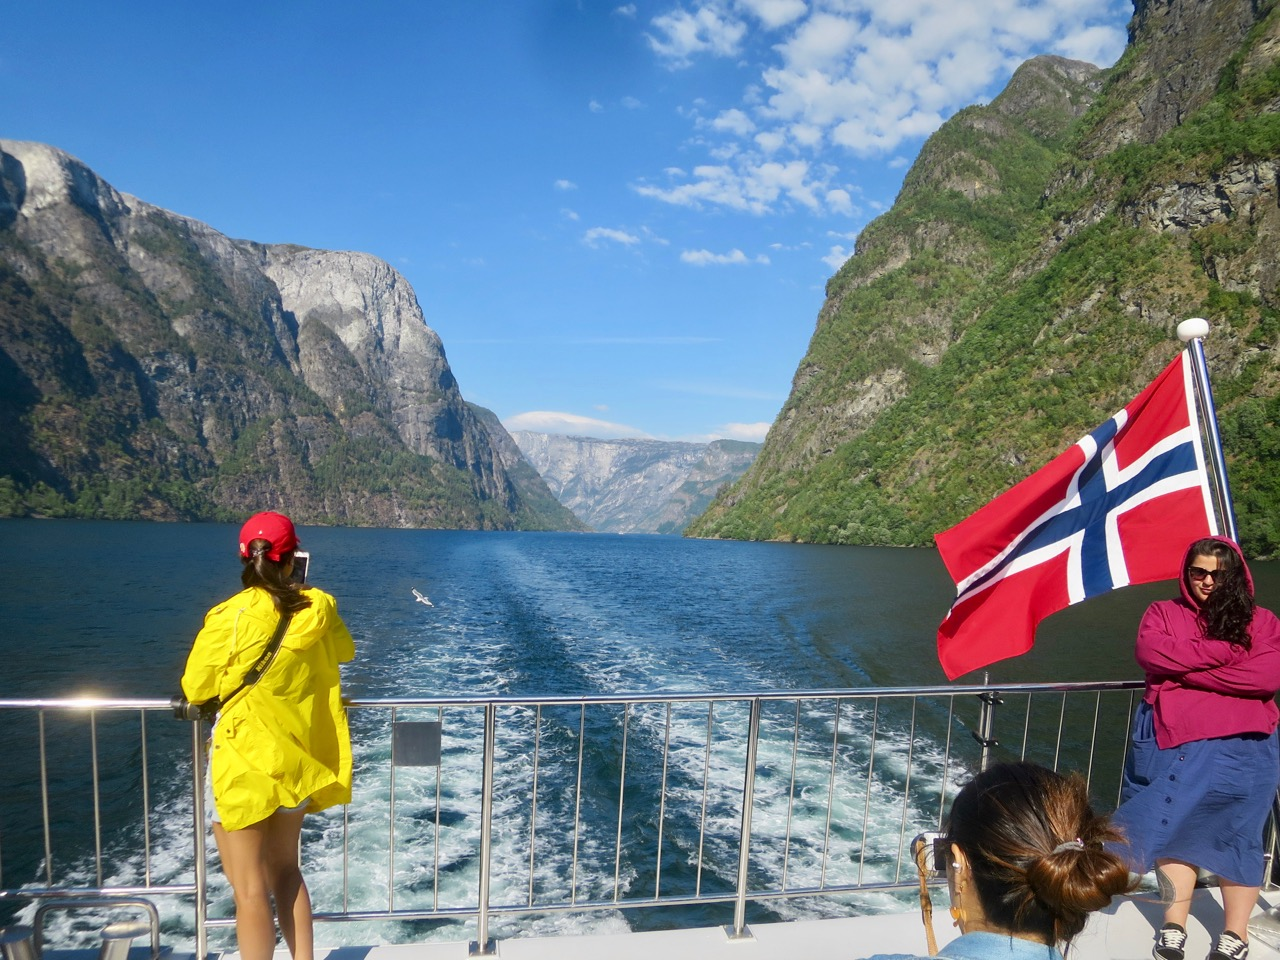 Paisagens Noruega 1 13